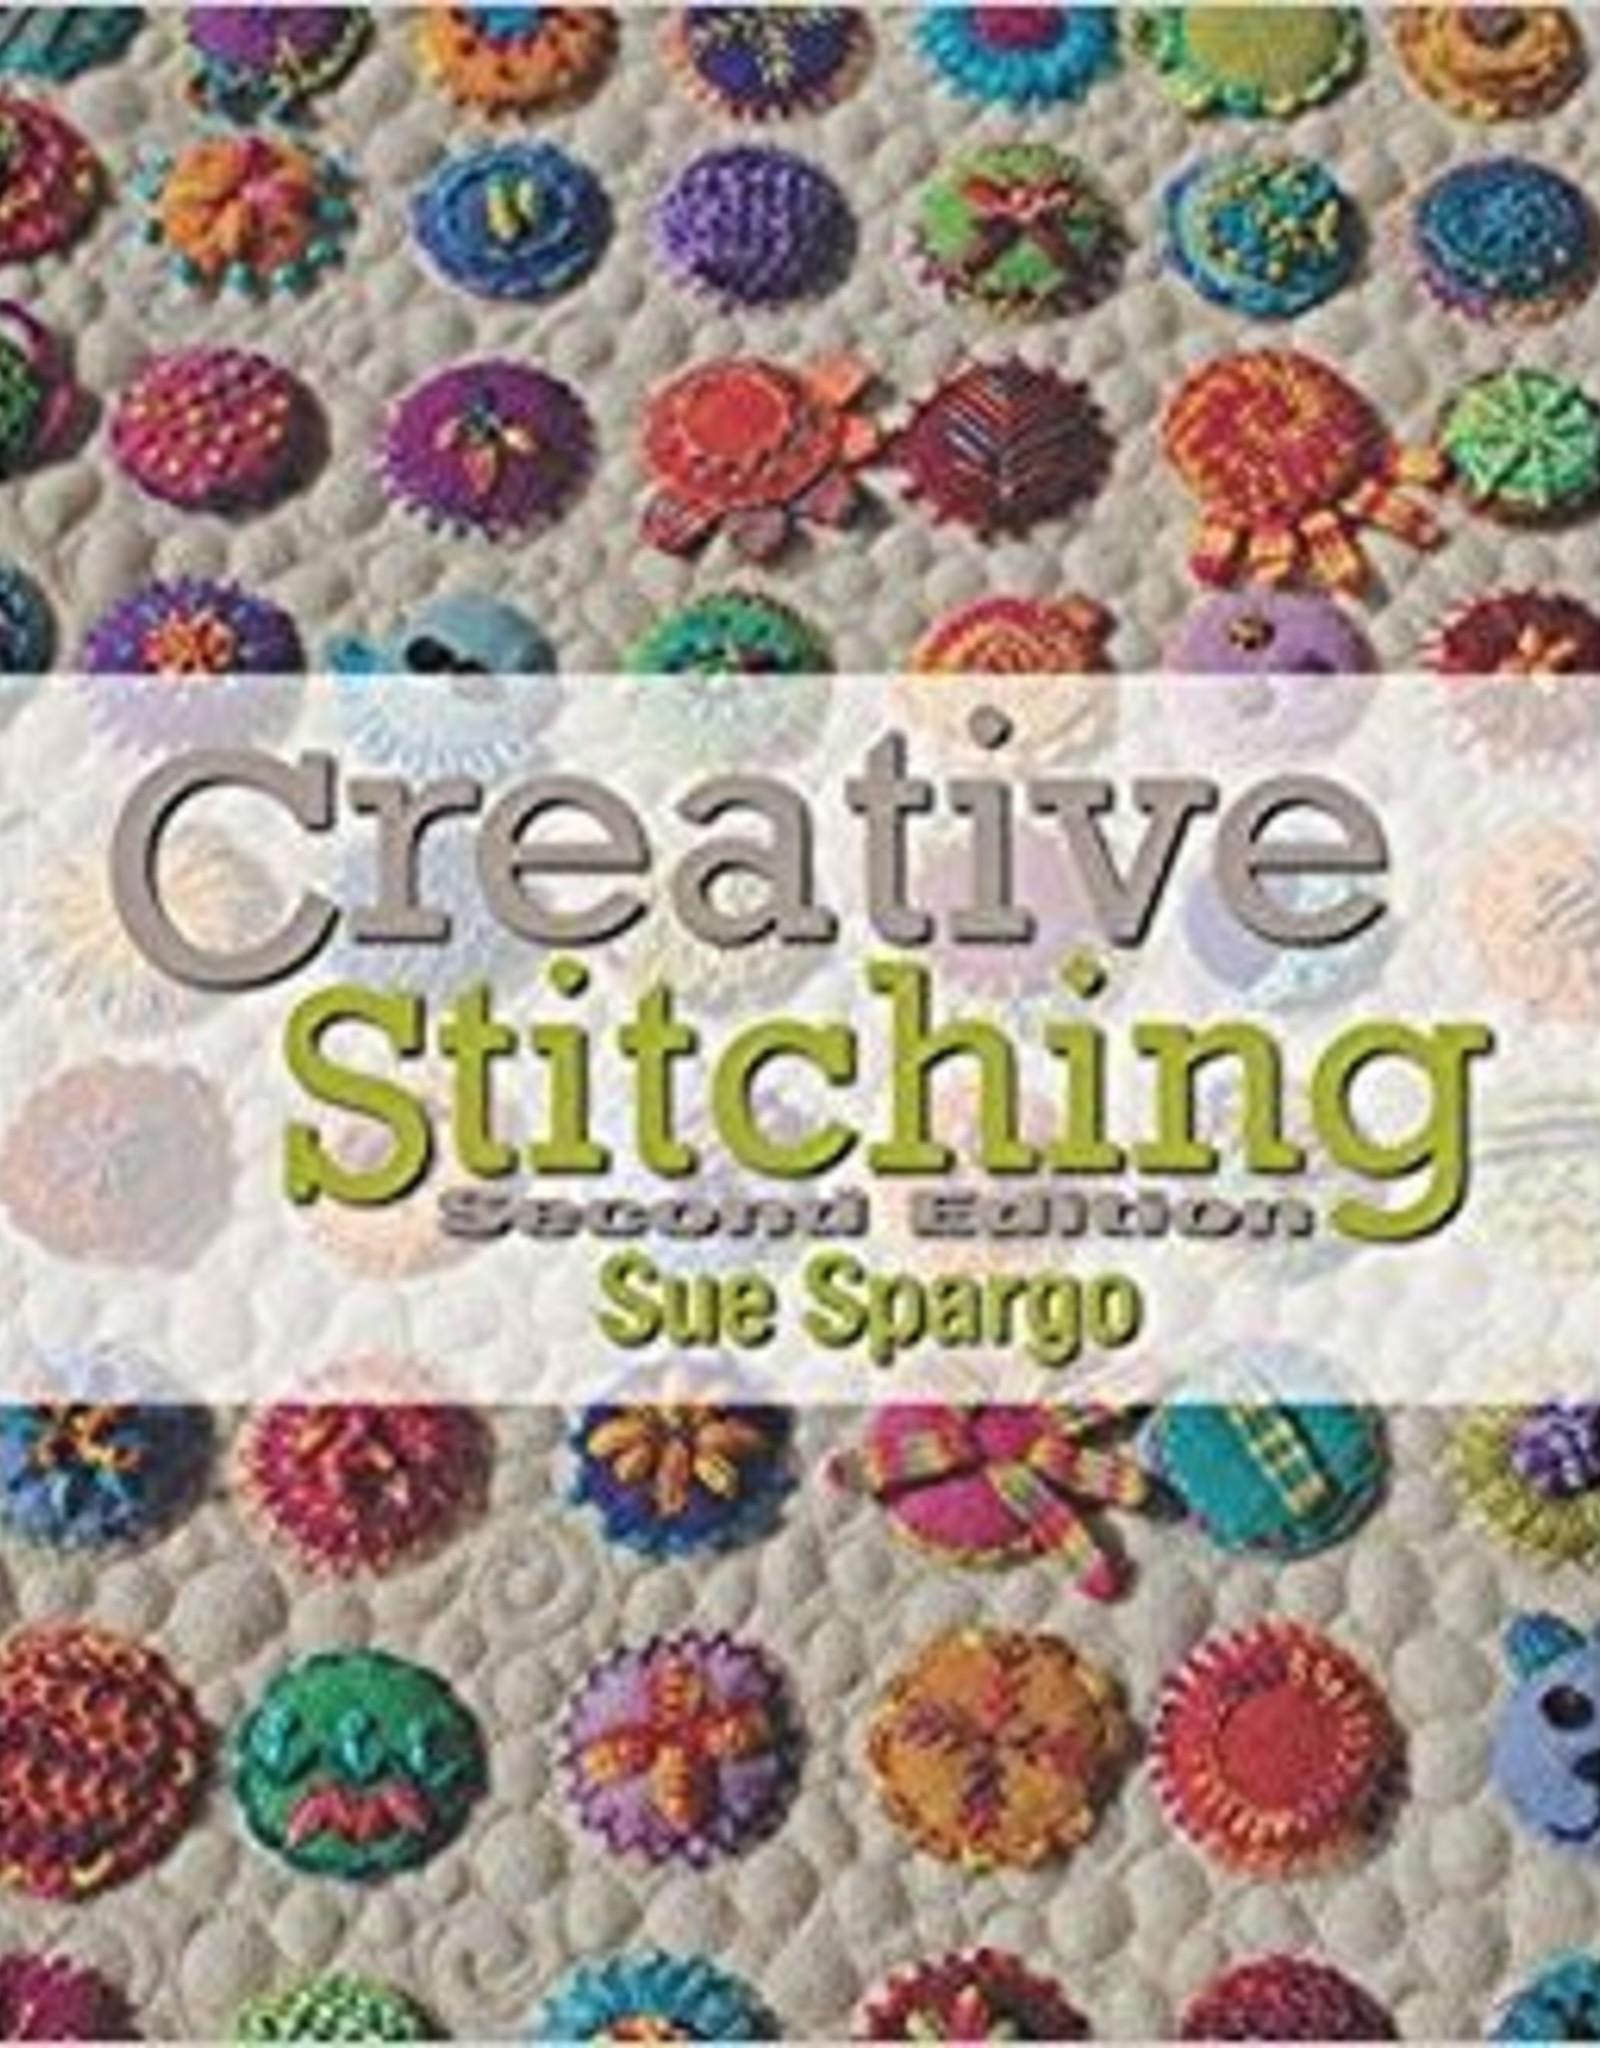 Sue Spargo Creative Stitching; Second Edition by Sue Spargo